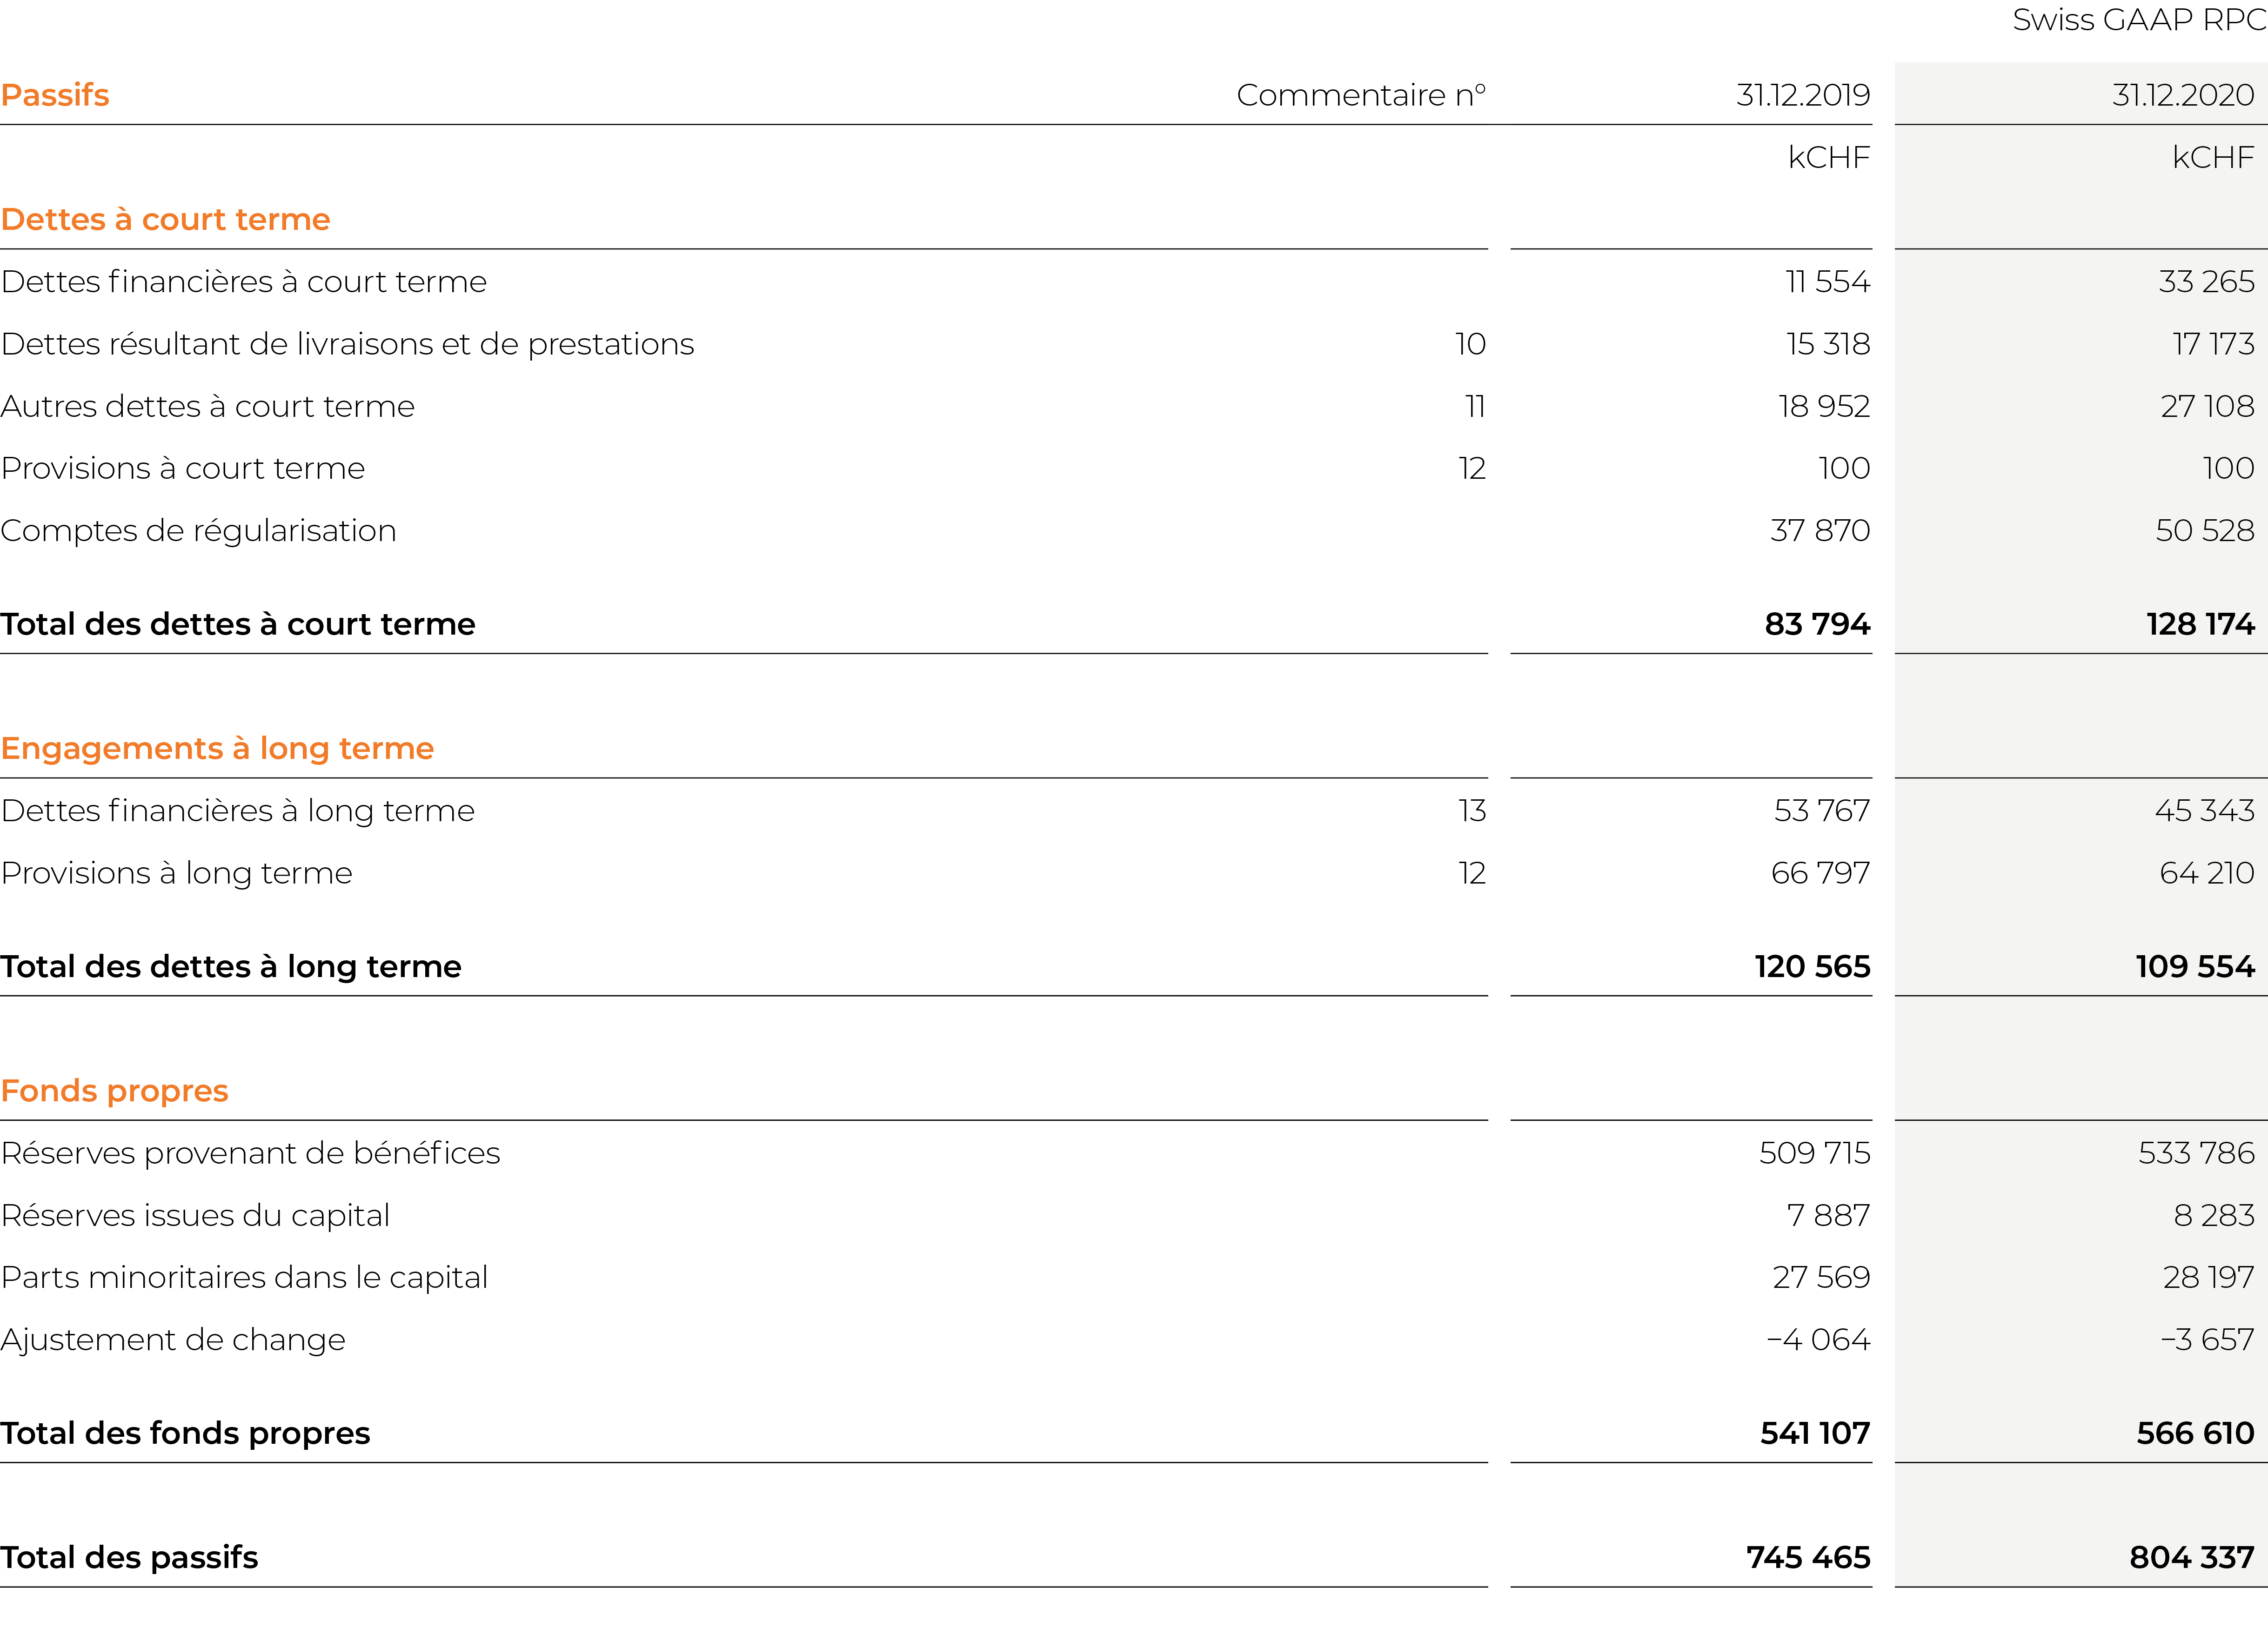 EBL_GB-20_Kons_Bilanz_Passiven_FR